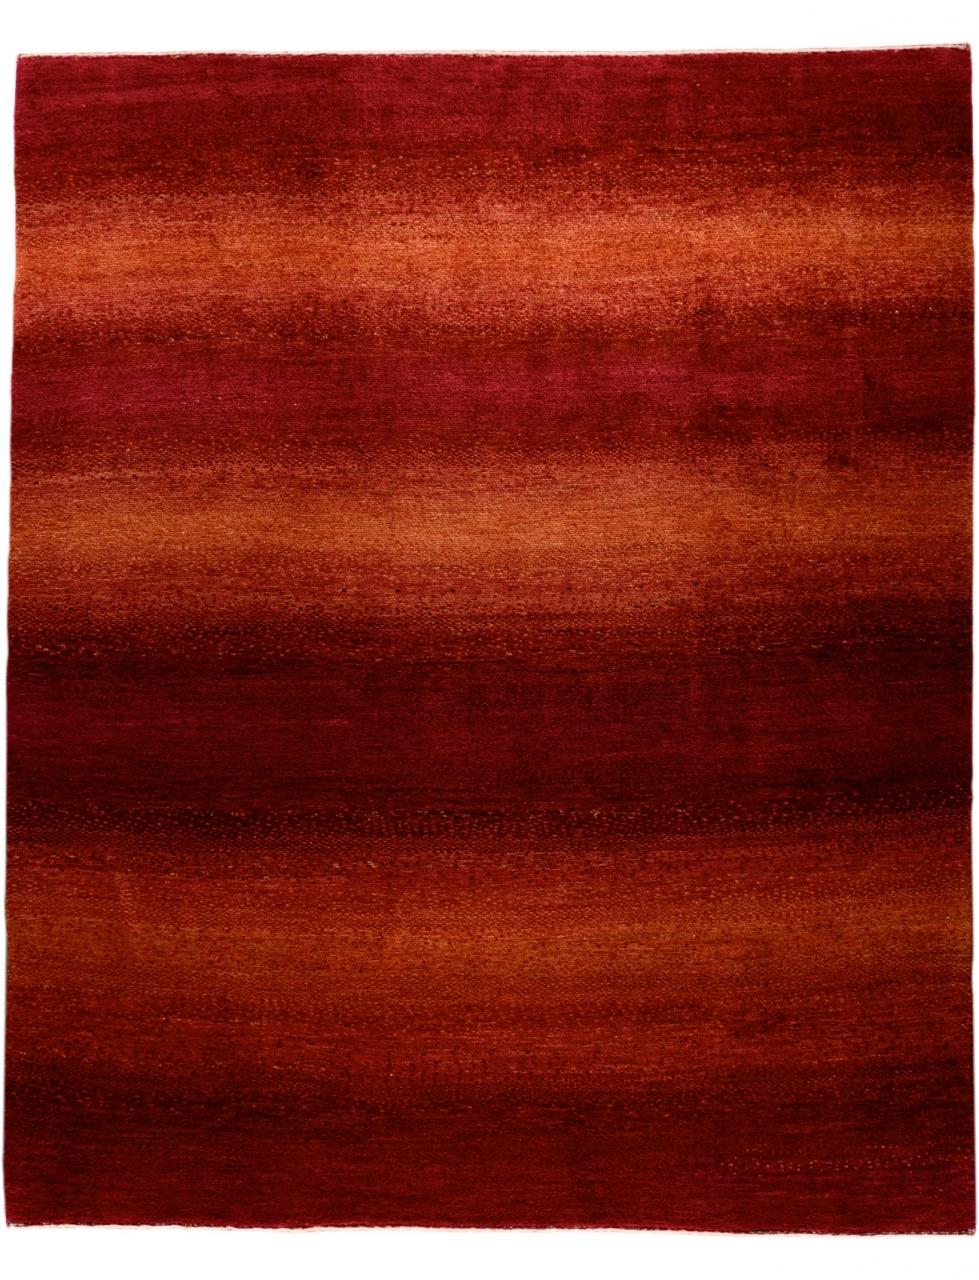 Iran Gabbeh Teppich-Unikat Ruby Red